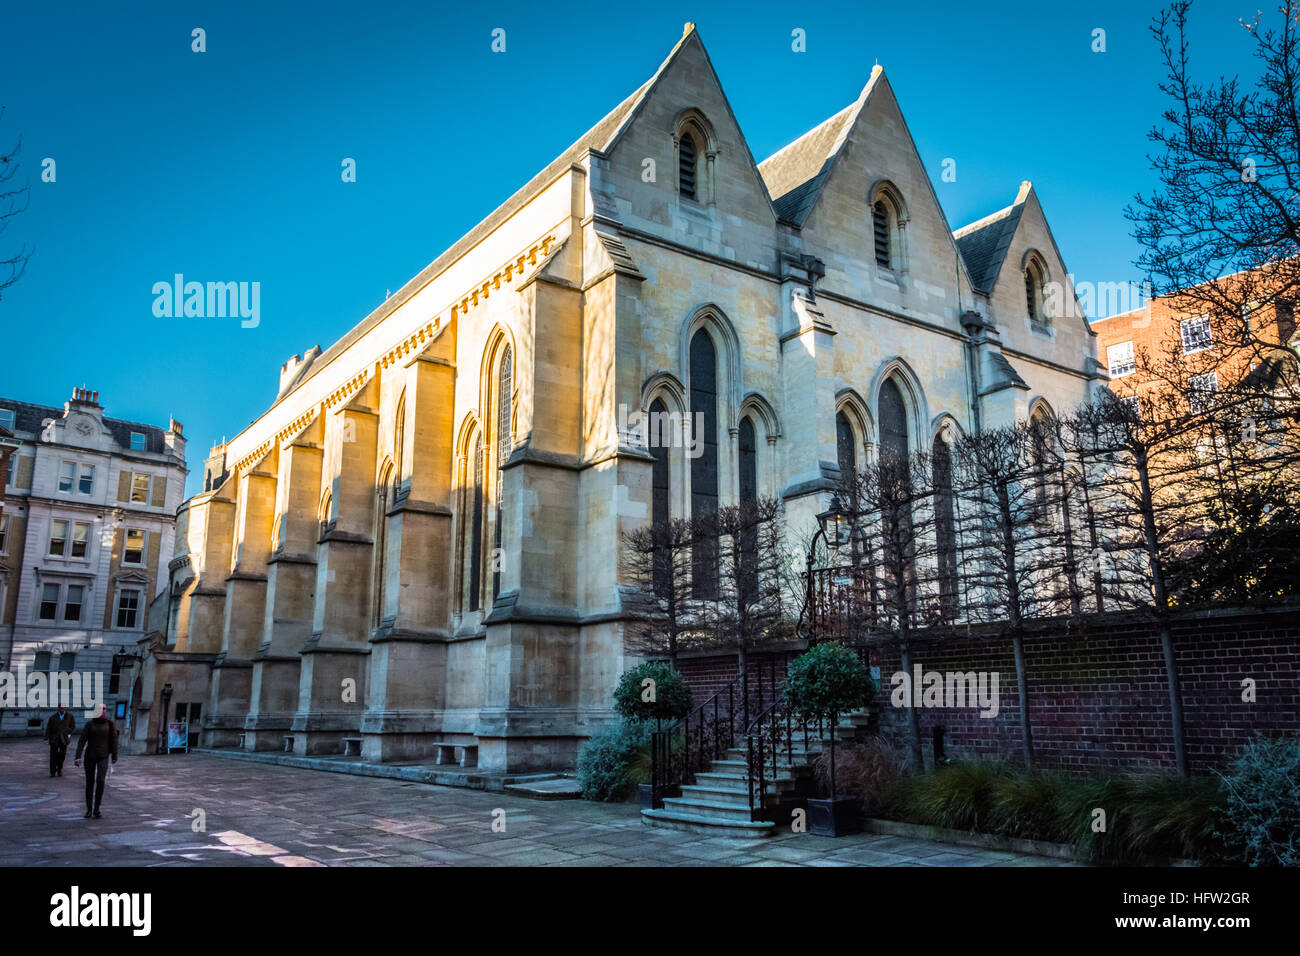 Temple Church, Inns of Court, London, UK, - Stock Image